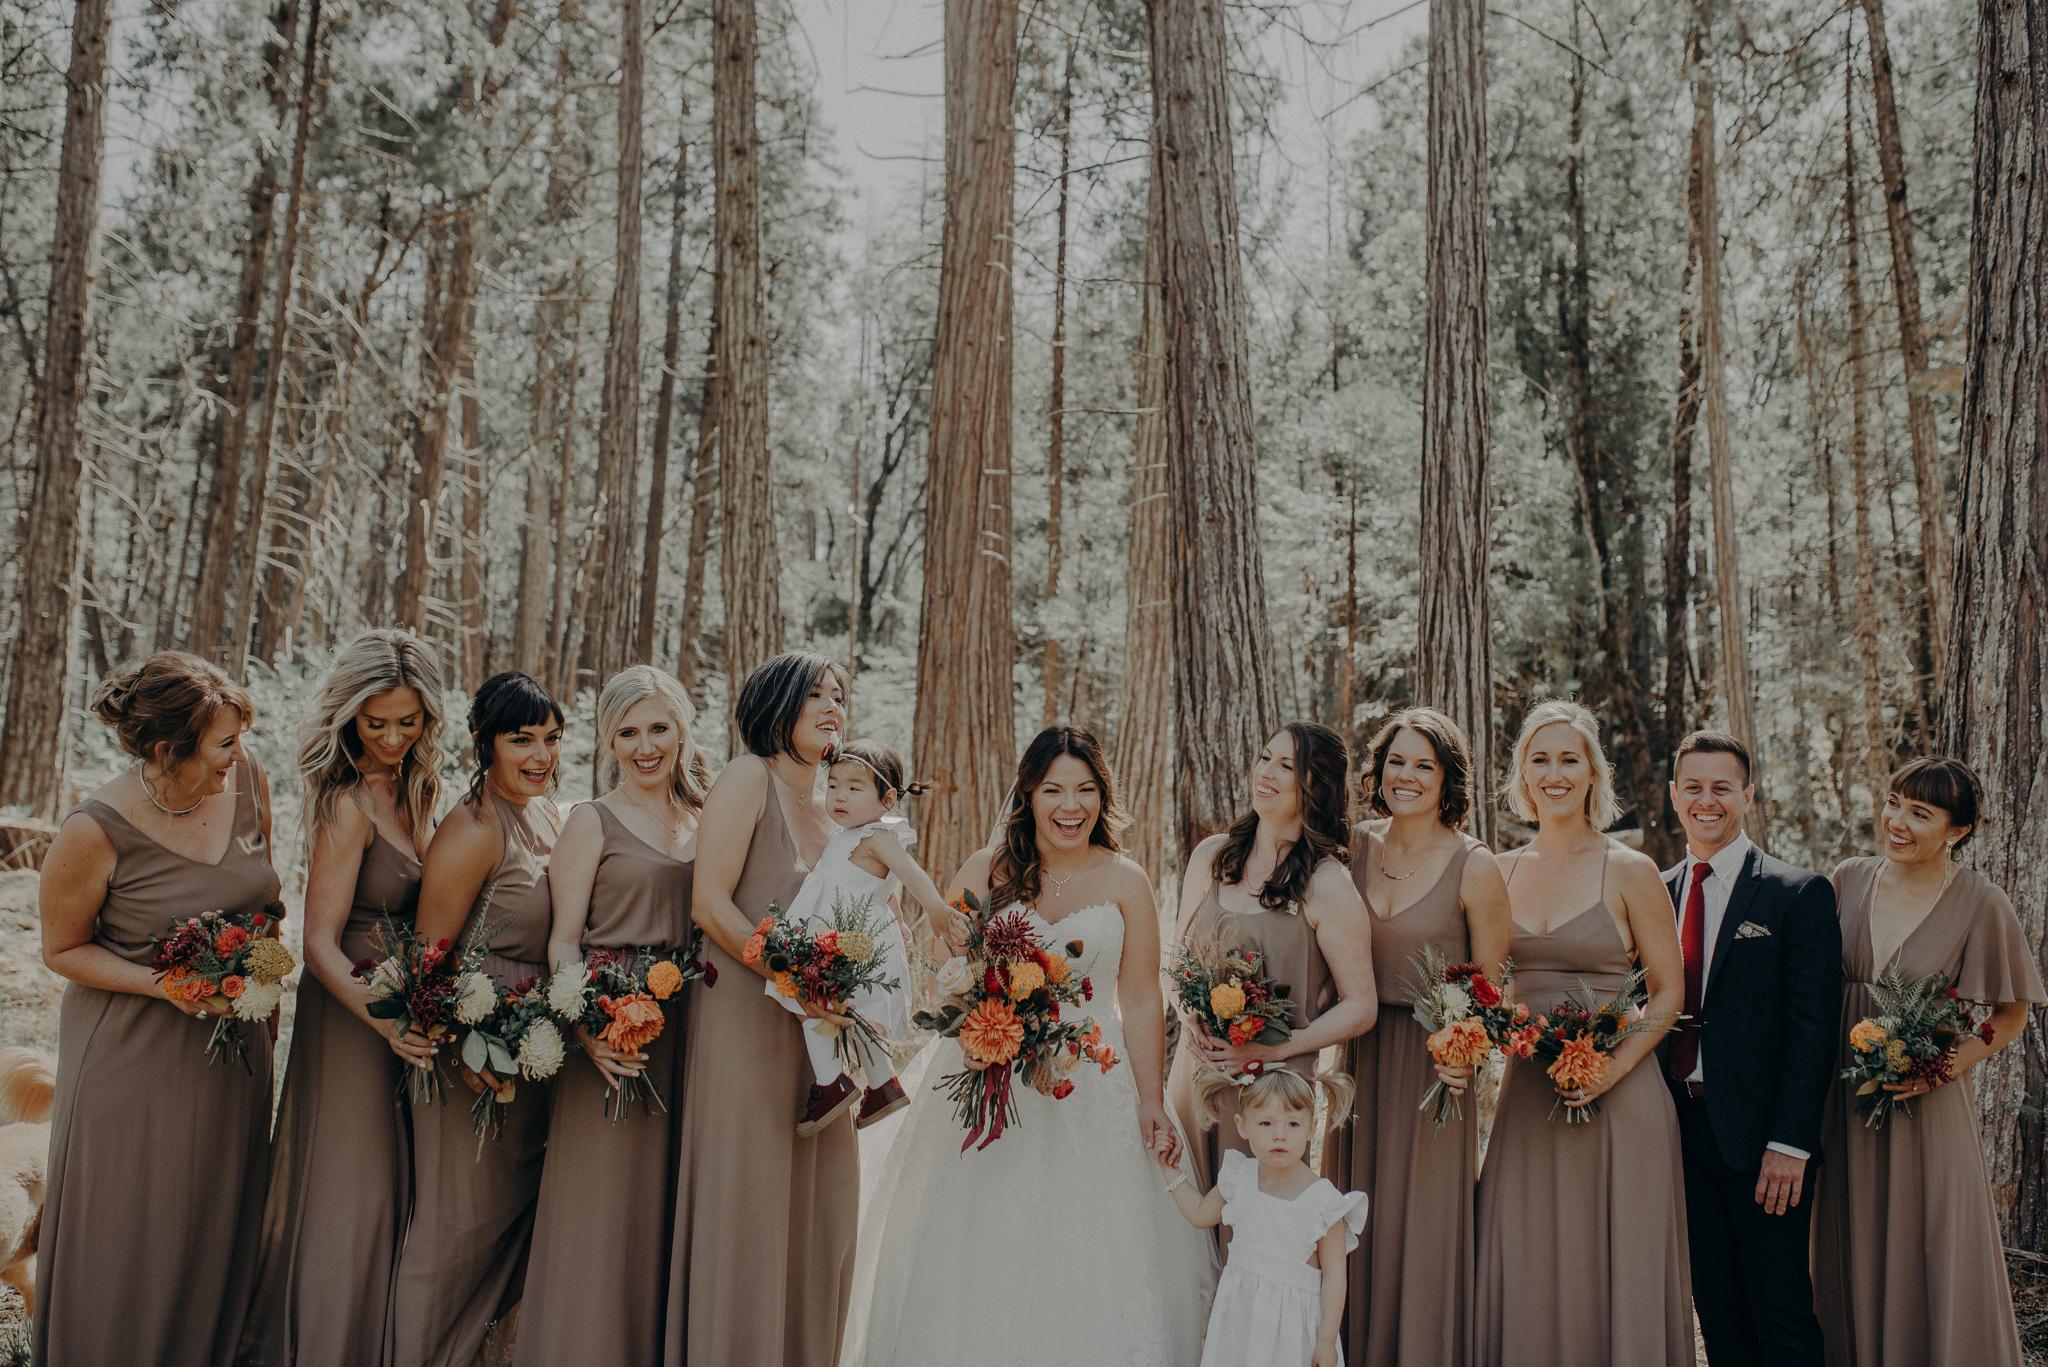 Yosemite Elopement Photographer - Evergreen Lodge Wedding Photographer - IsaiahAndTaylor.com-084.jpg